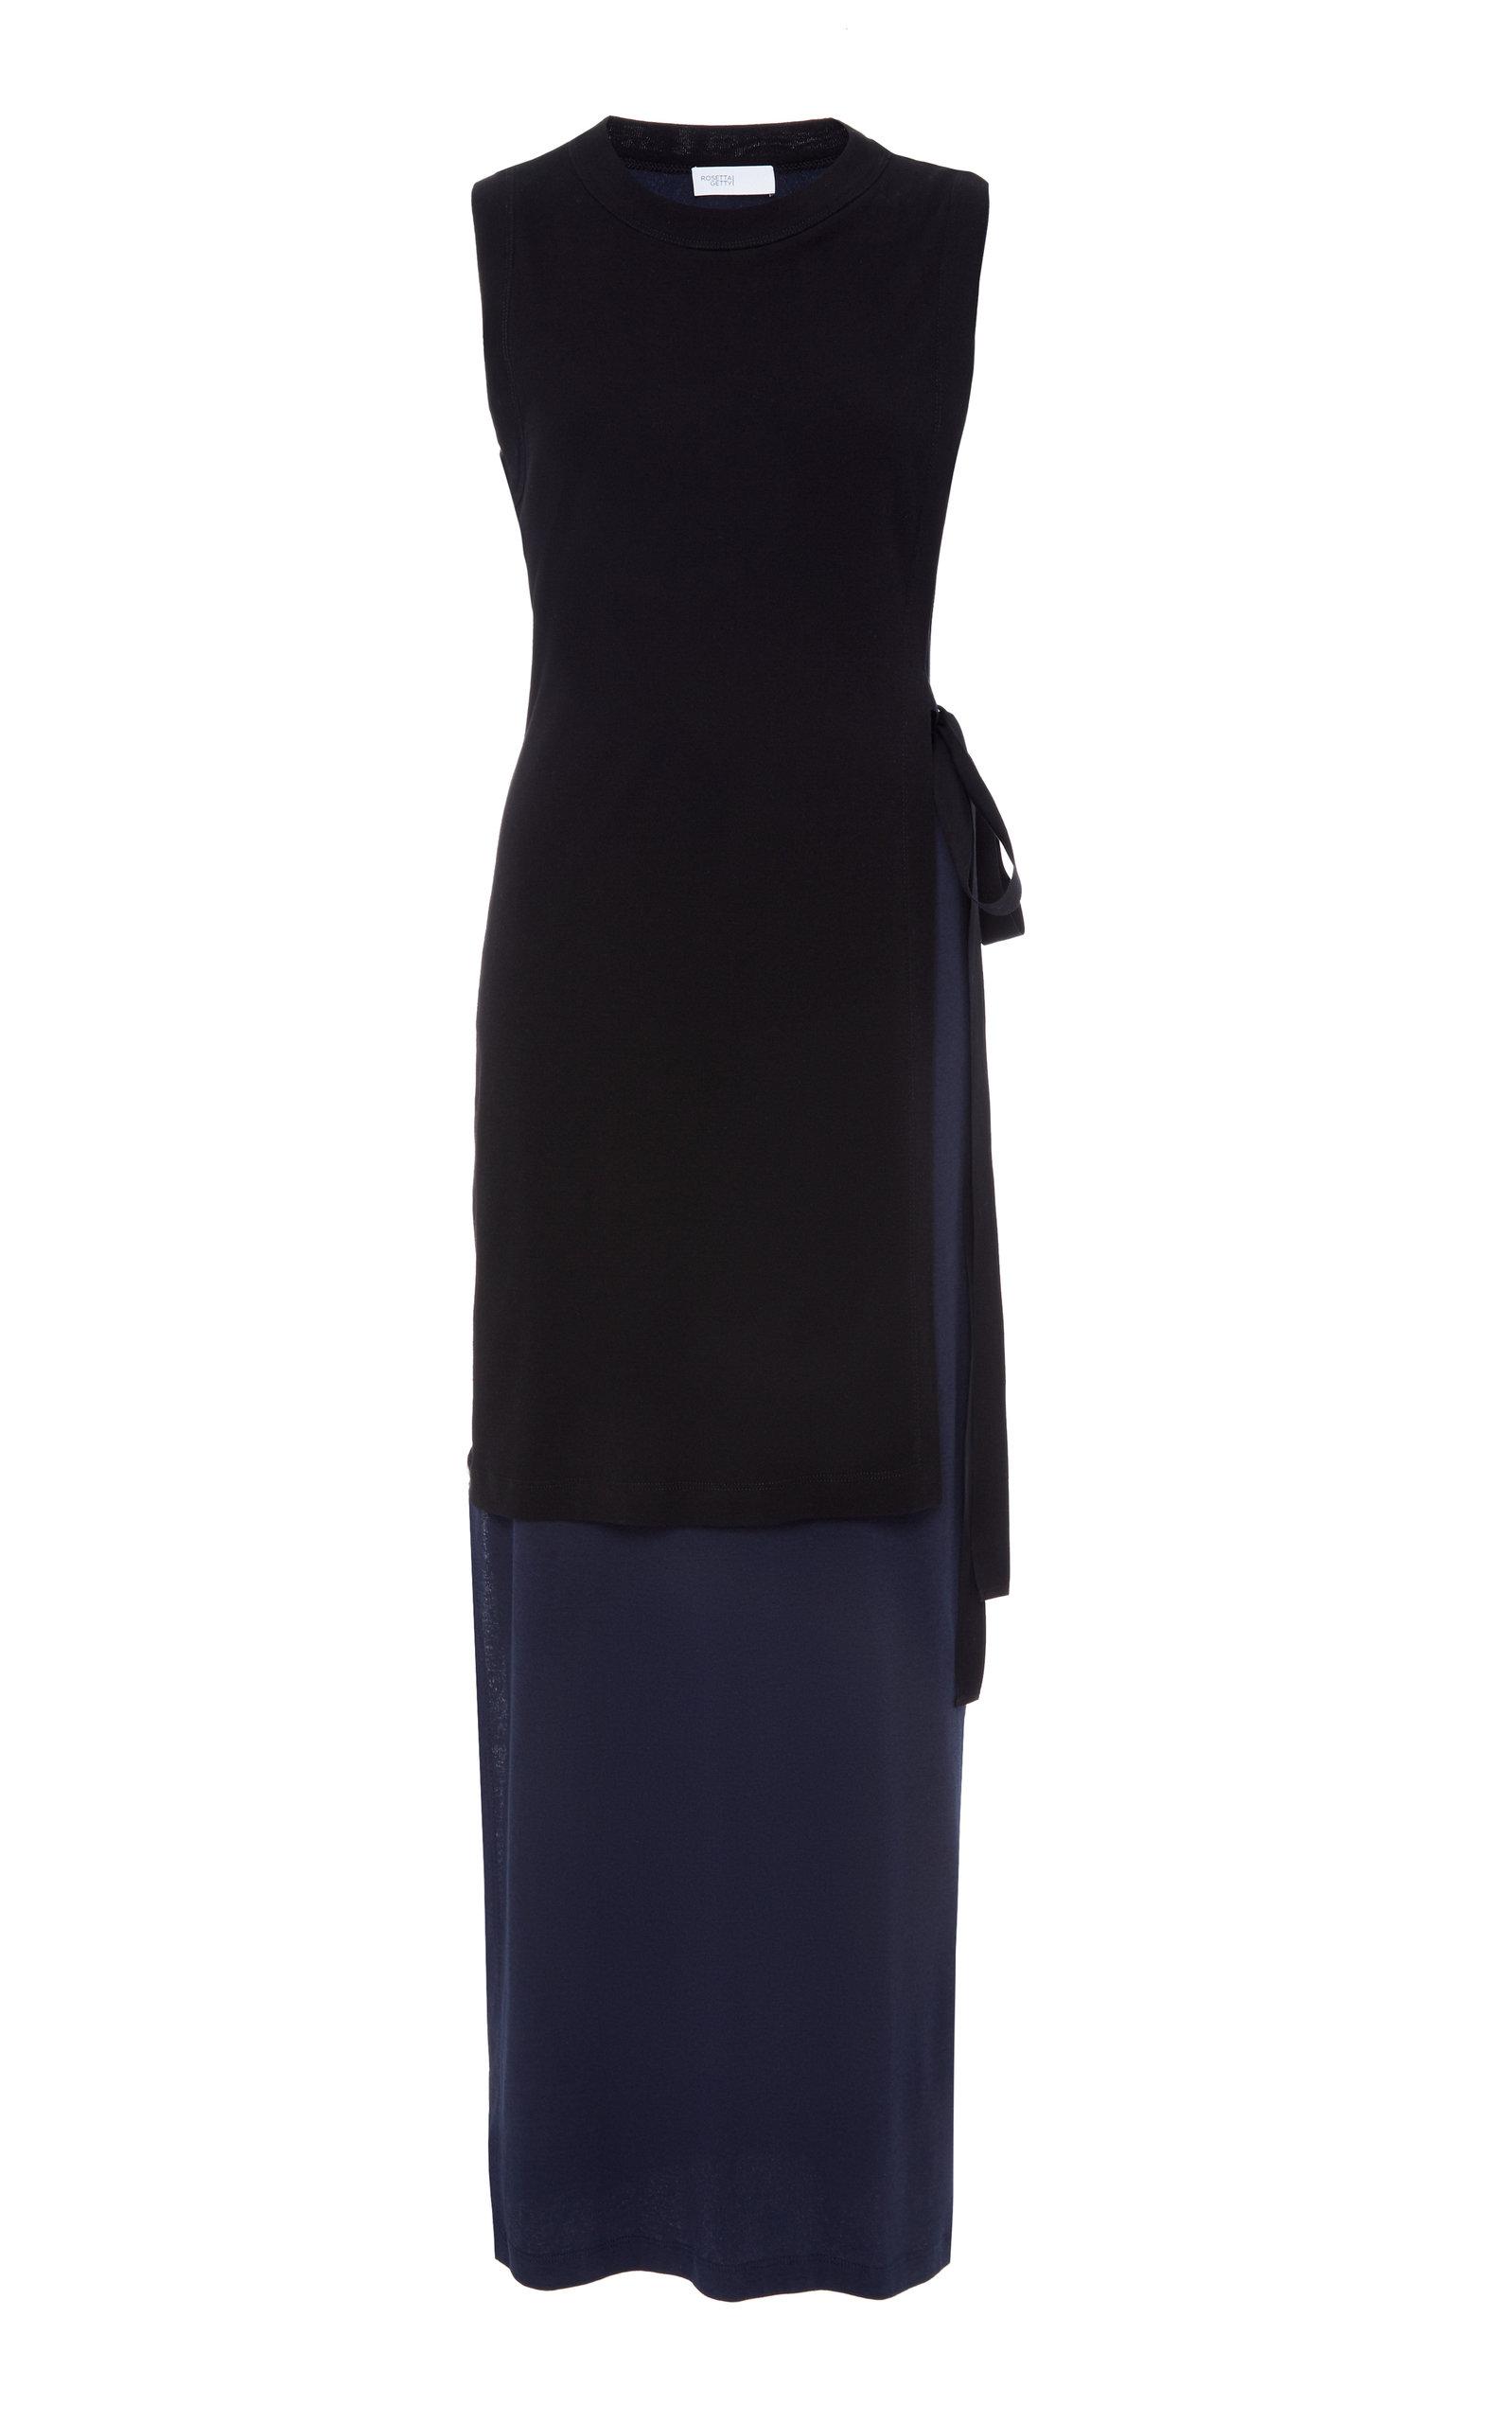 b59908cbda12e Rosetta GettyTie-Detailed Layered Cotton Dress. CLOSE. Loading